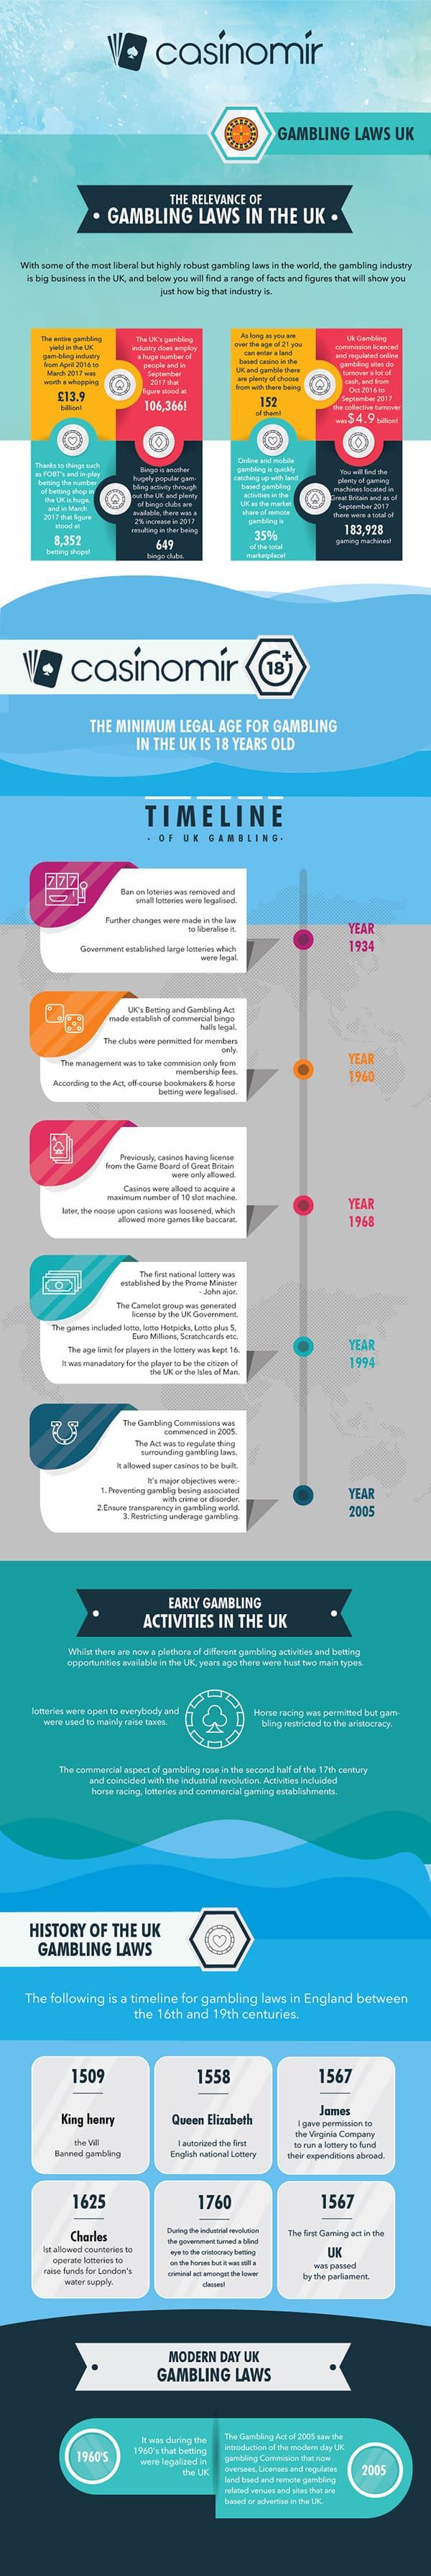 gambling laws infographic